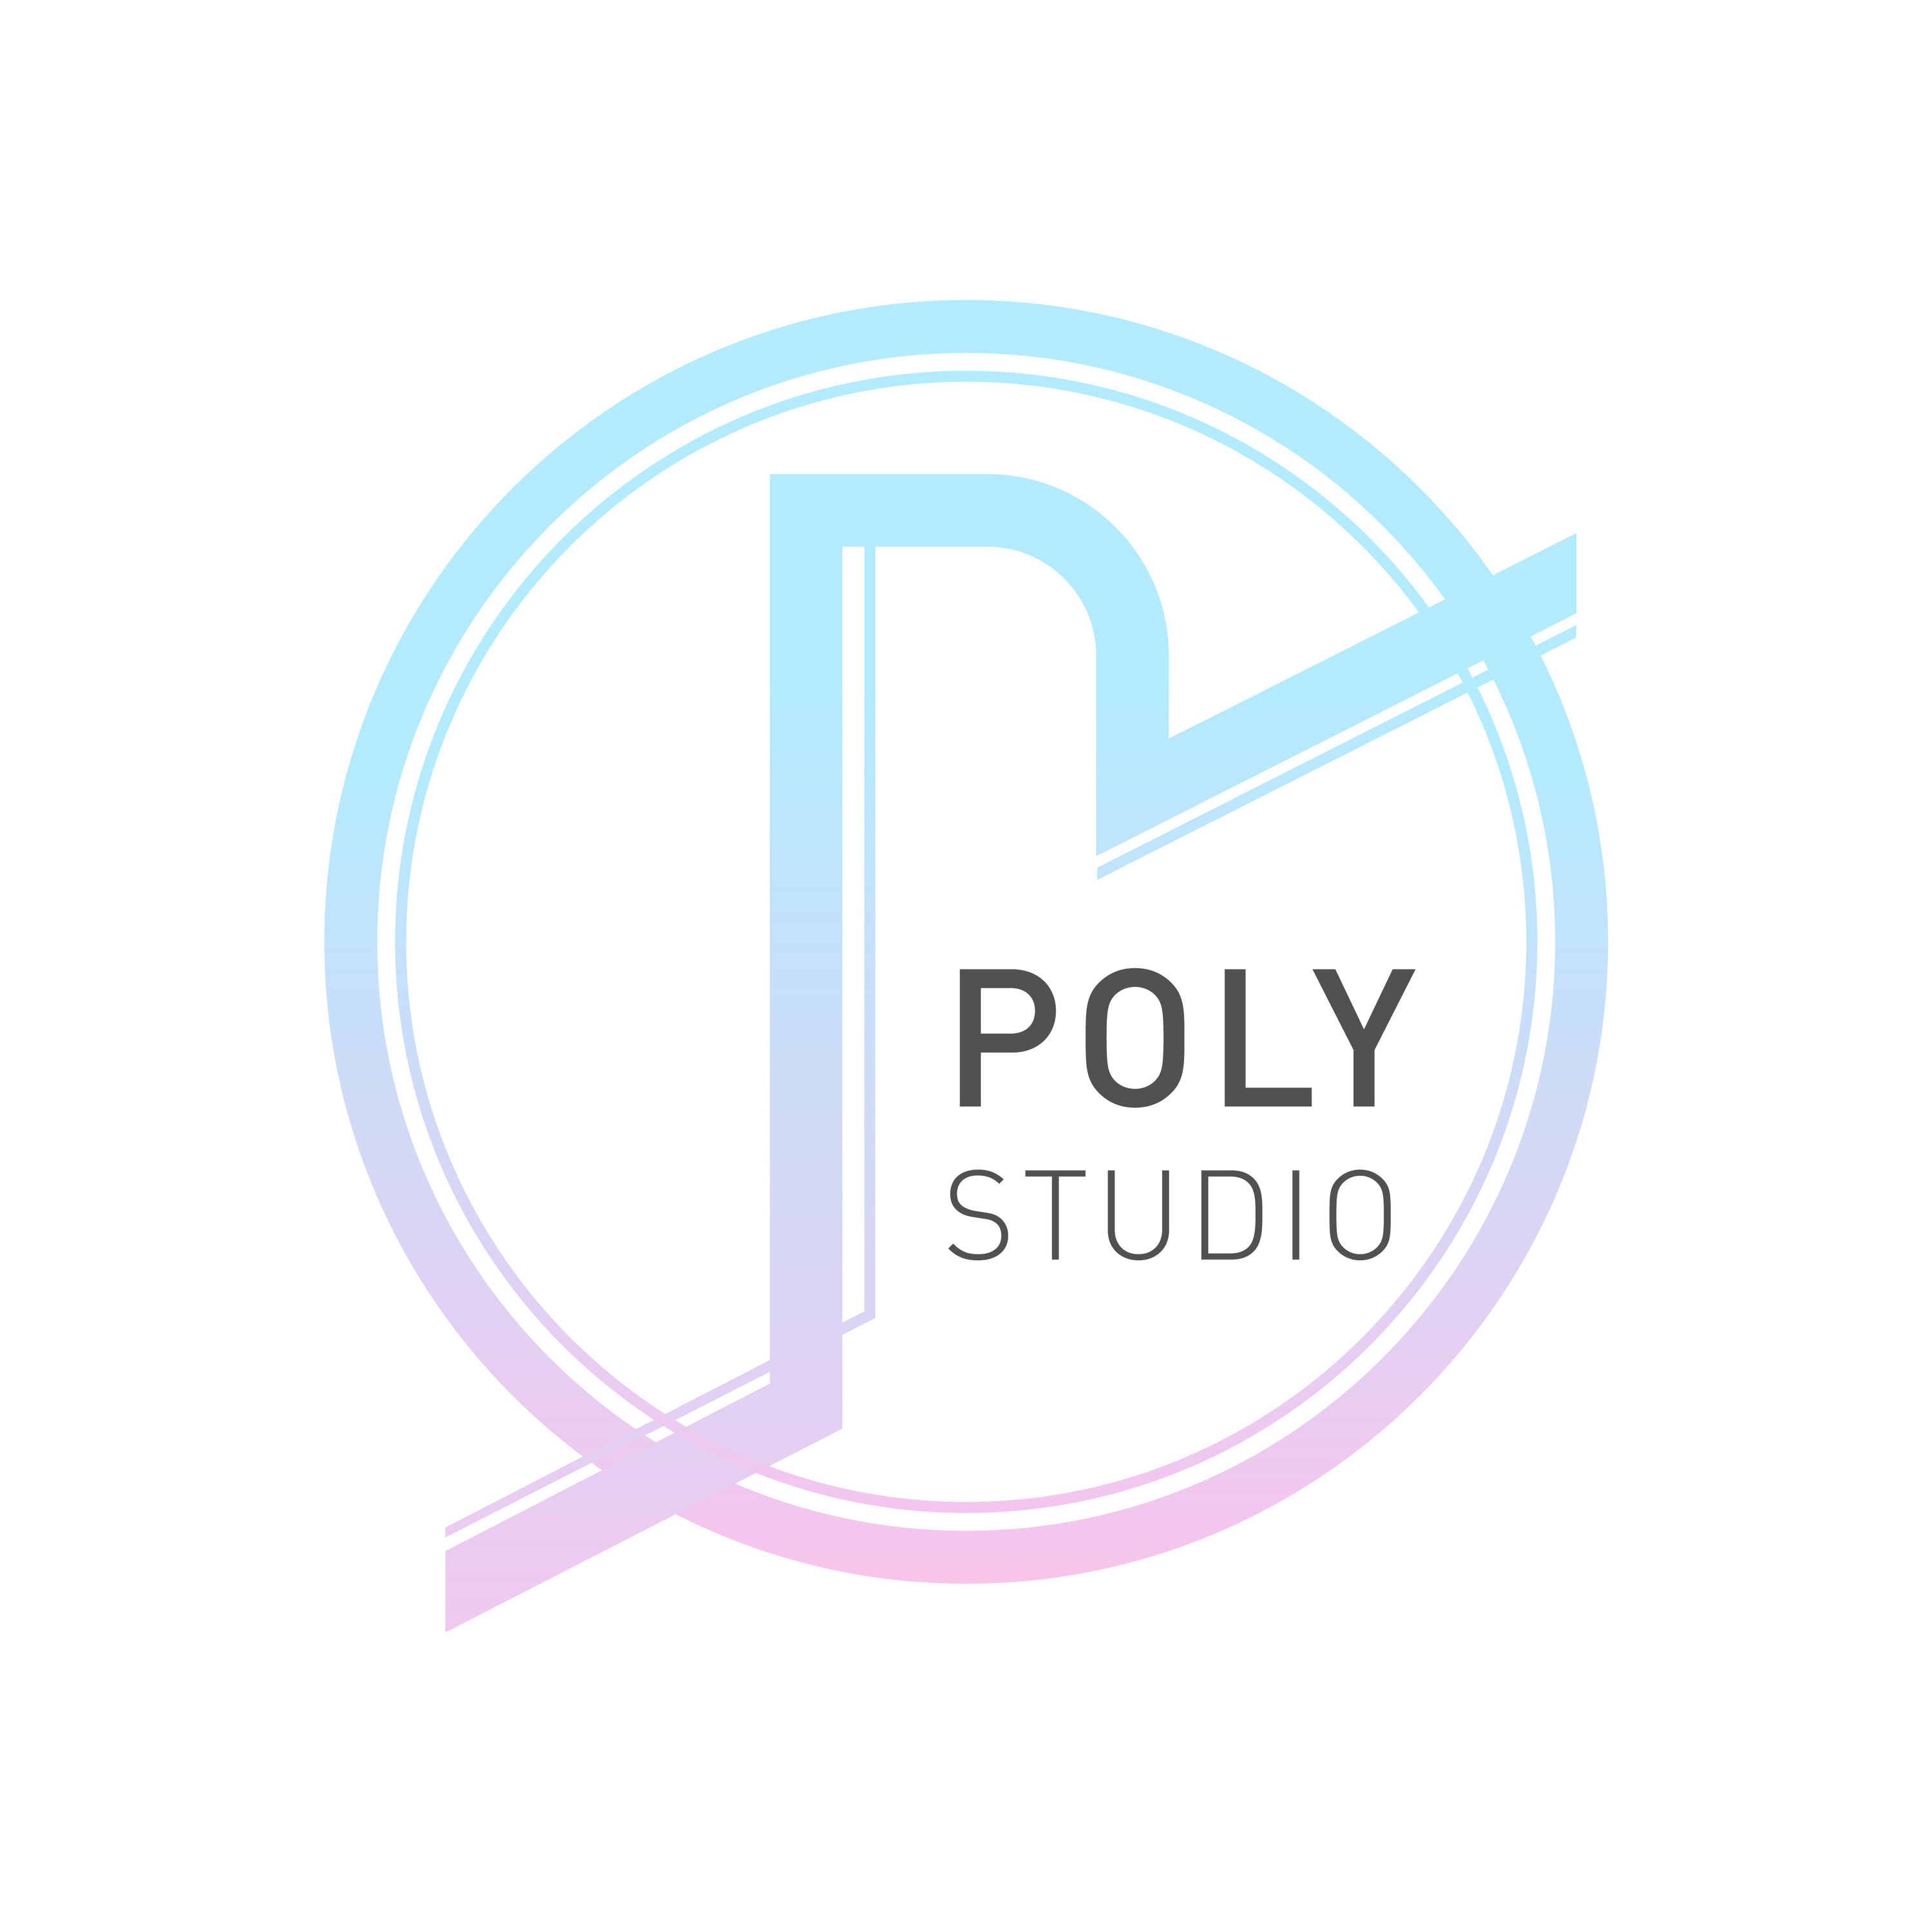 Poly Podcast (波力工作室)